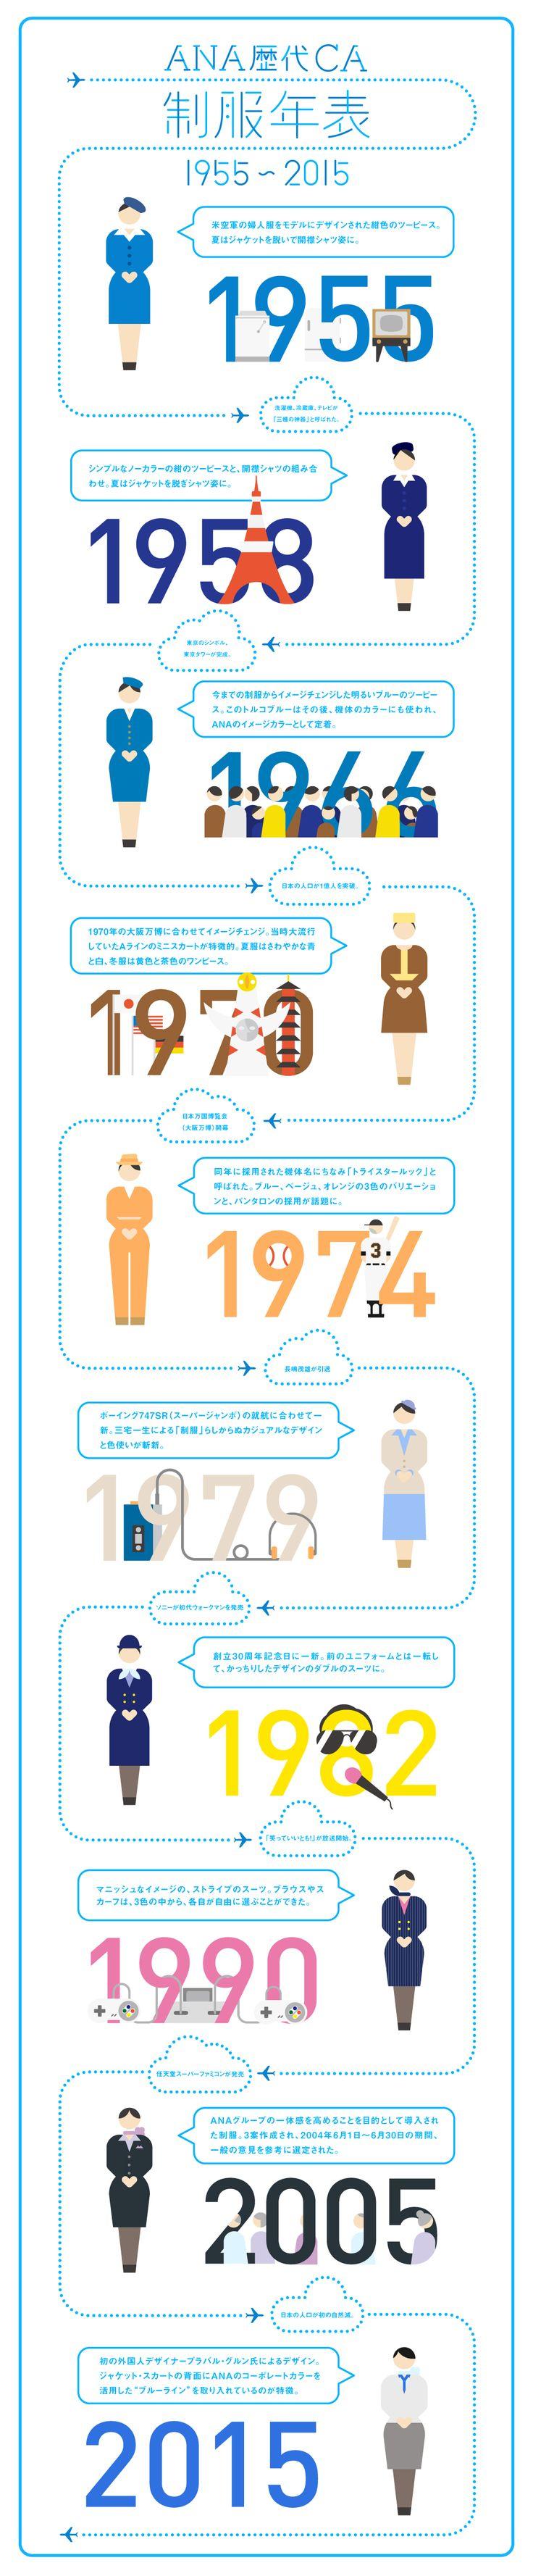 ANA歴代CA制服年表 1955~2015|Infographics|ANA Travel & Life